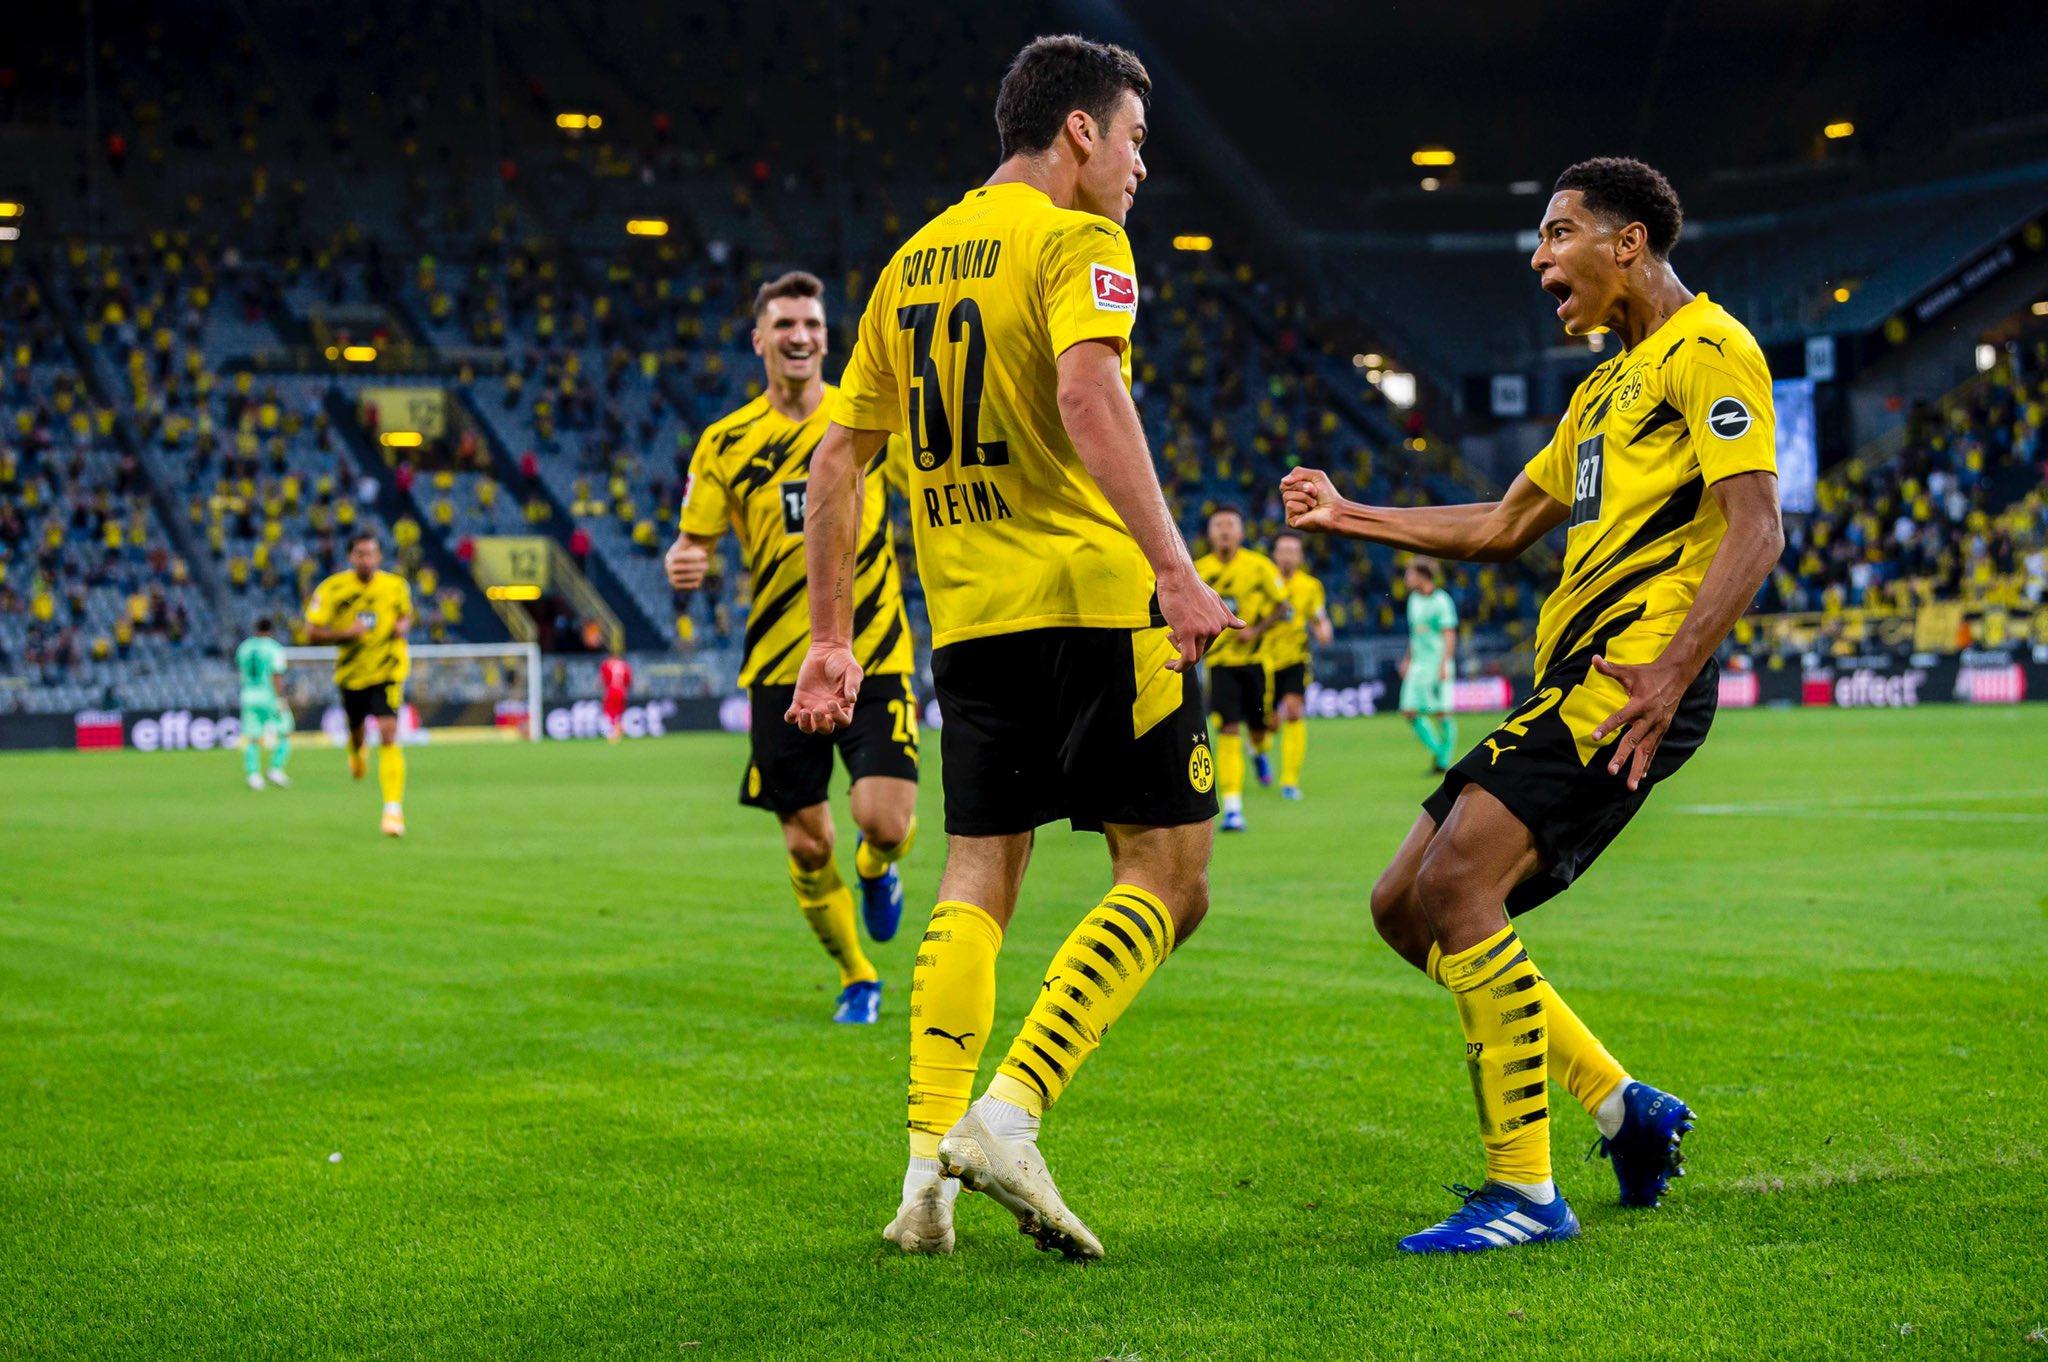 Дортмунд - Гладбах 3:0. Победа семнадцатилетних - изображение 1